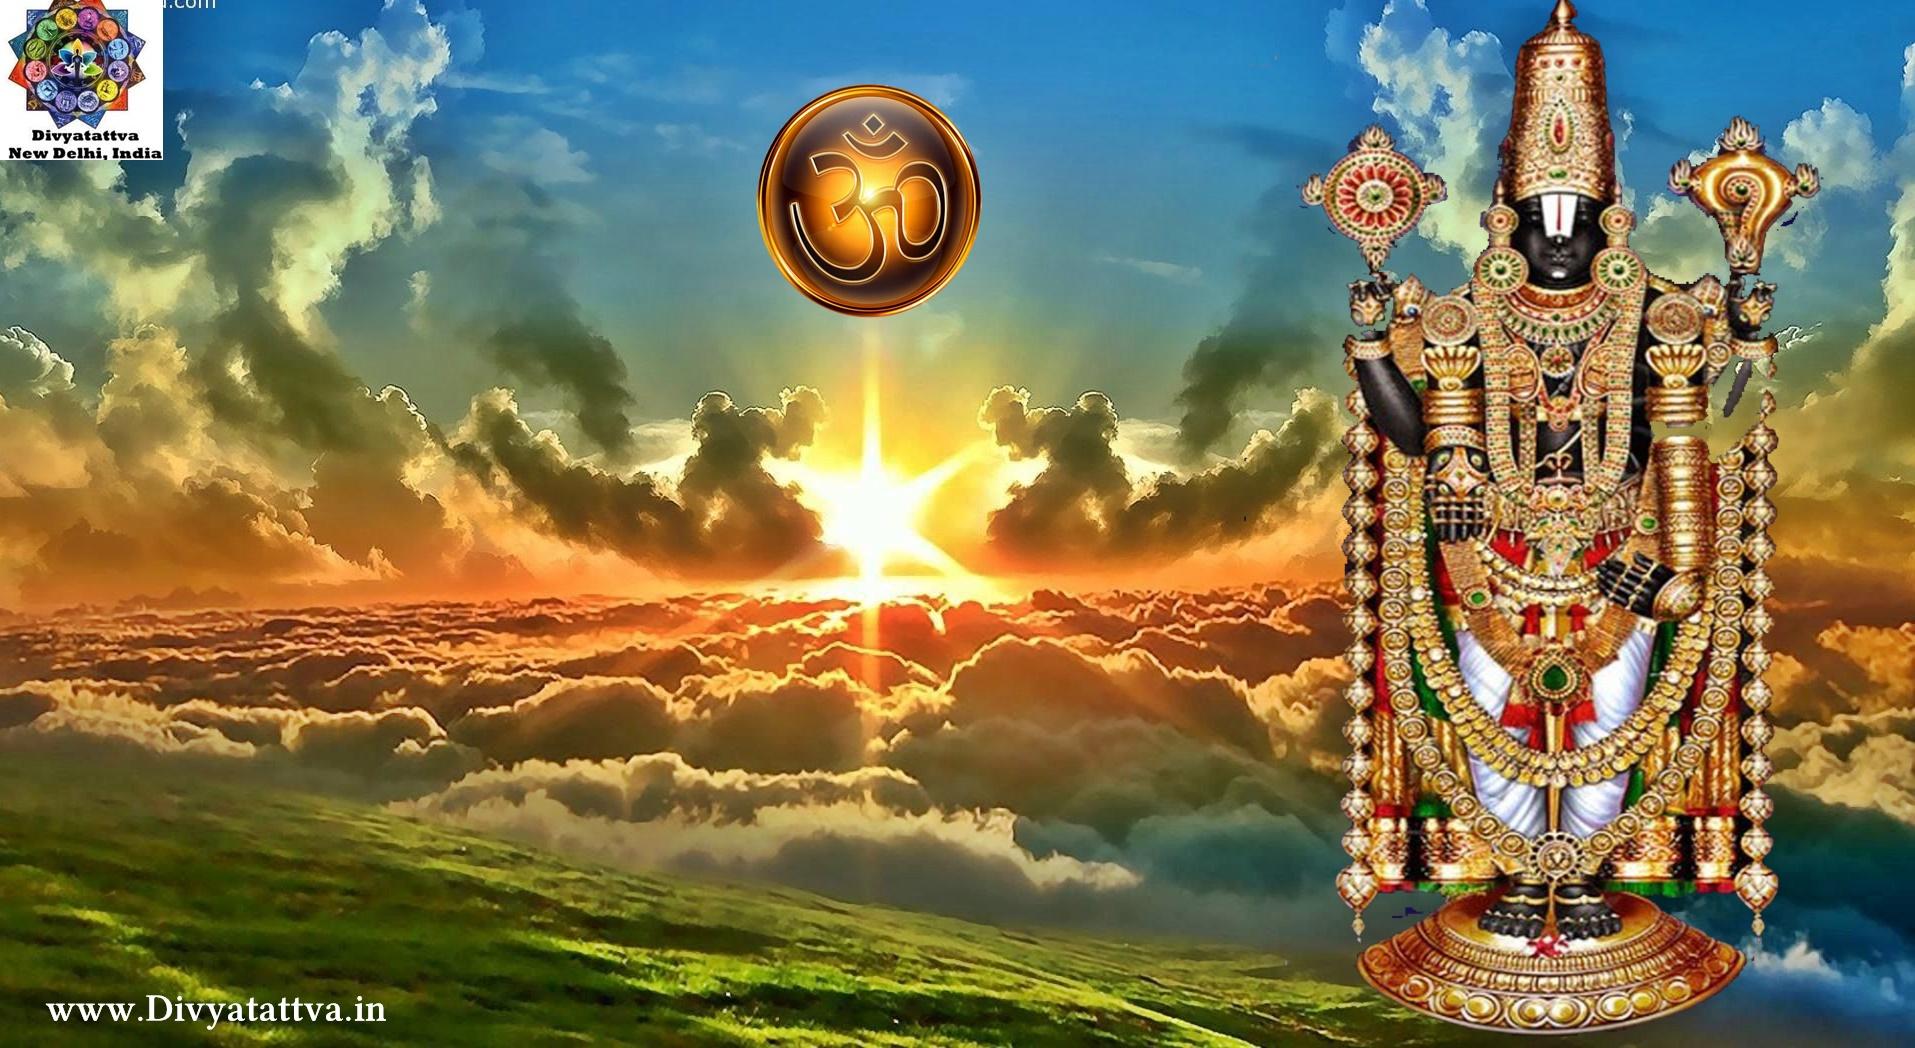 tirupati balaji best images, tirupati balaji best wallpaper, tirupati balaji bhagwan image